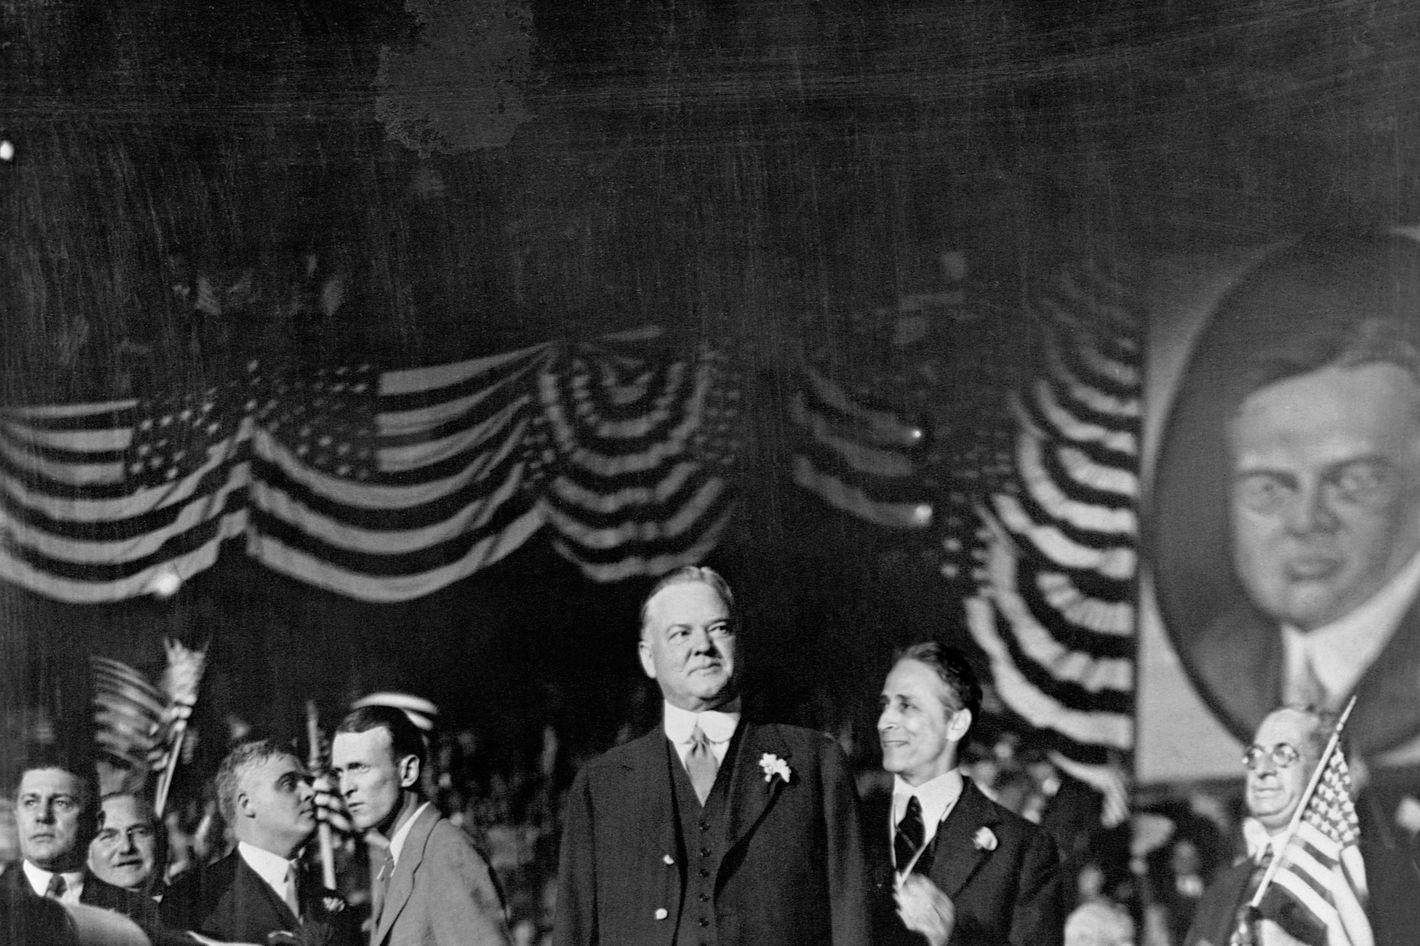 ca. 1928 --- Herbert Hoover Campaigning in New York.